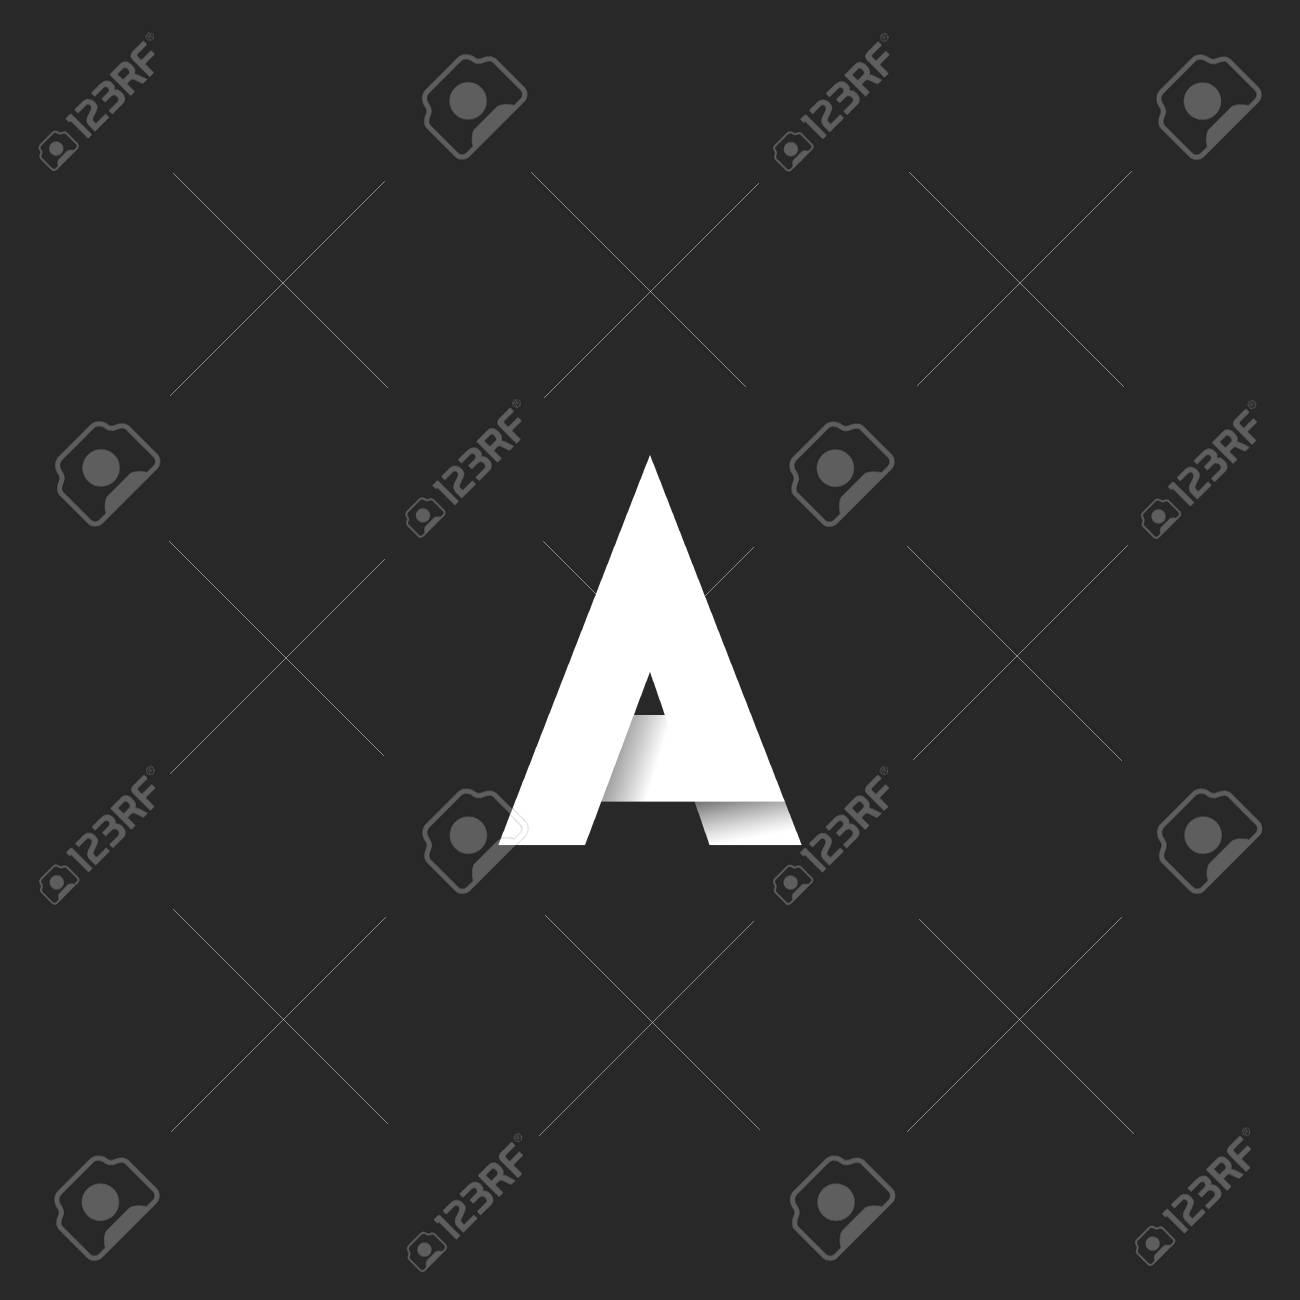 logo a letter bold font elegant black and white gradient style